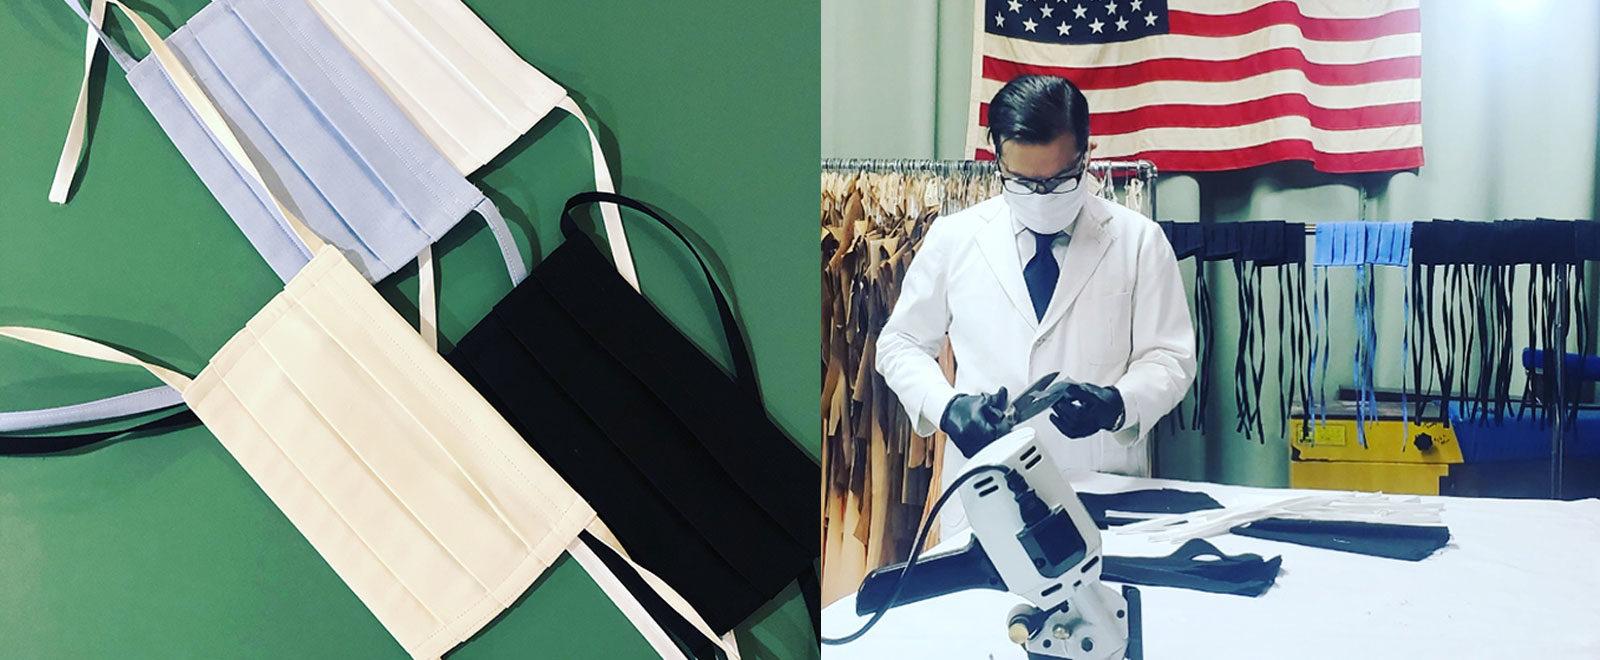 Craig Robinson Brooklyn Tailor Interview Masks COVID-19 Crisis pandemic